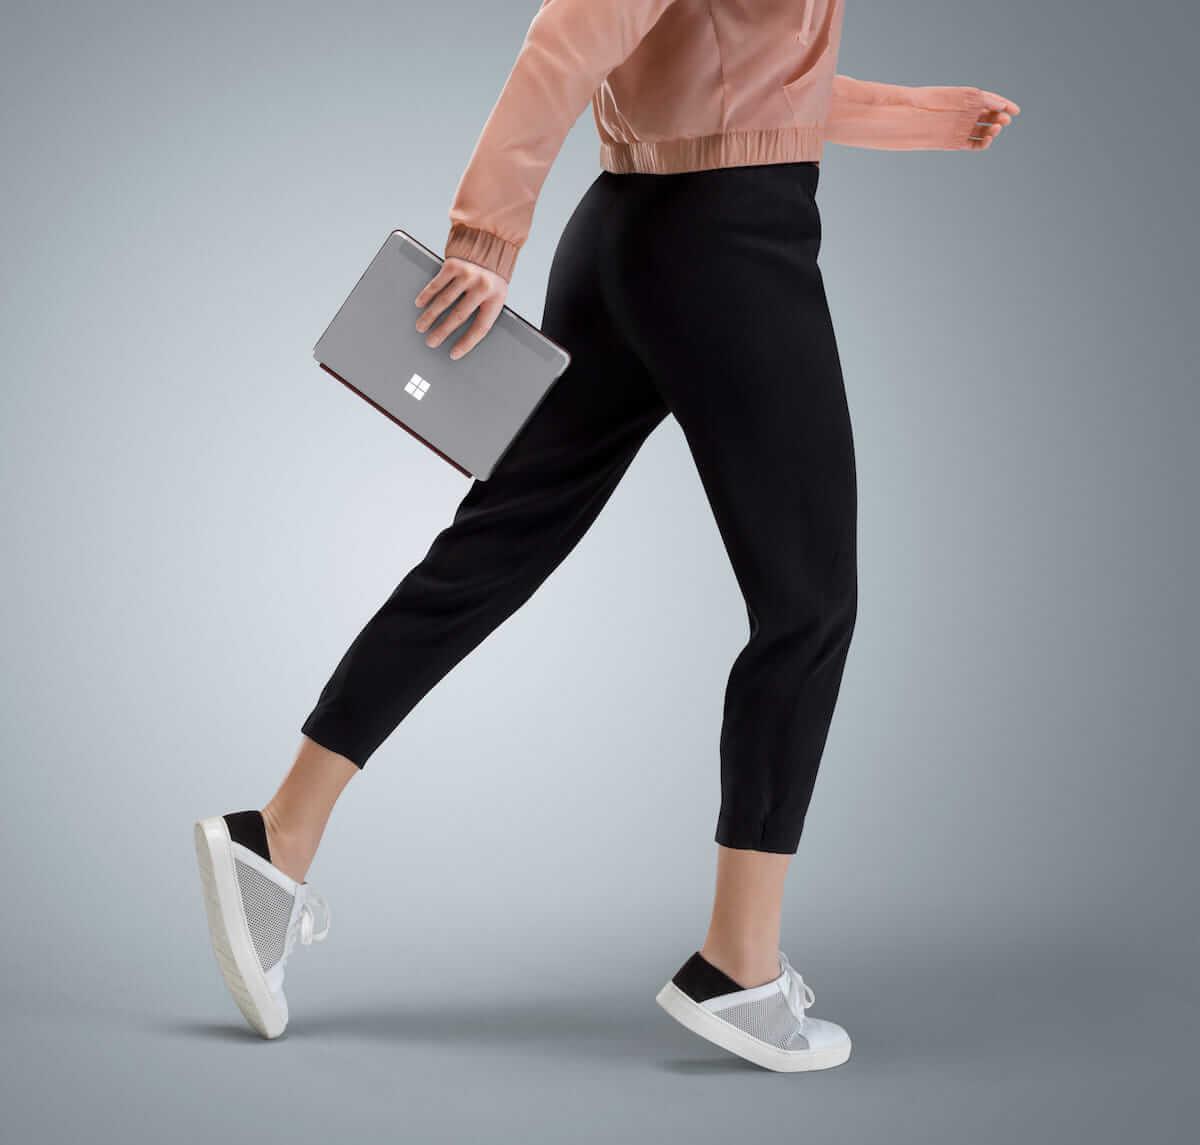 Surface GoはiPad Proを殺すのか?低価格、マウスも使えてフルOS搭載 technology180711_surface-go_2-1200x1145